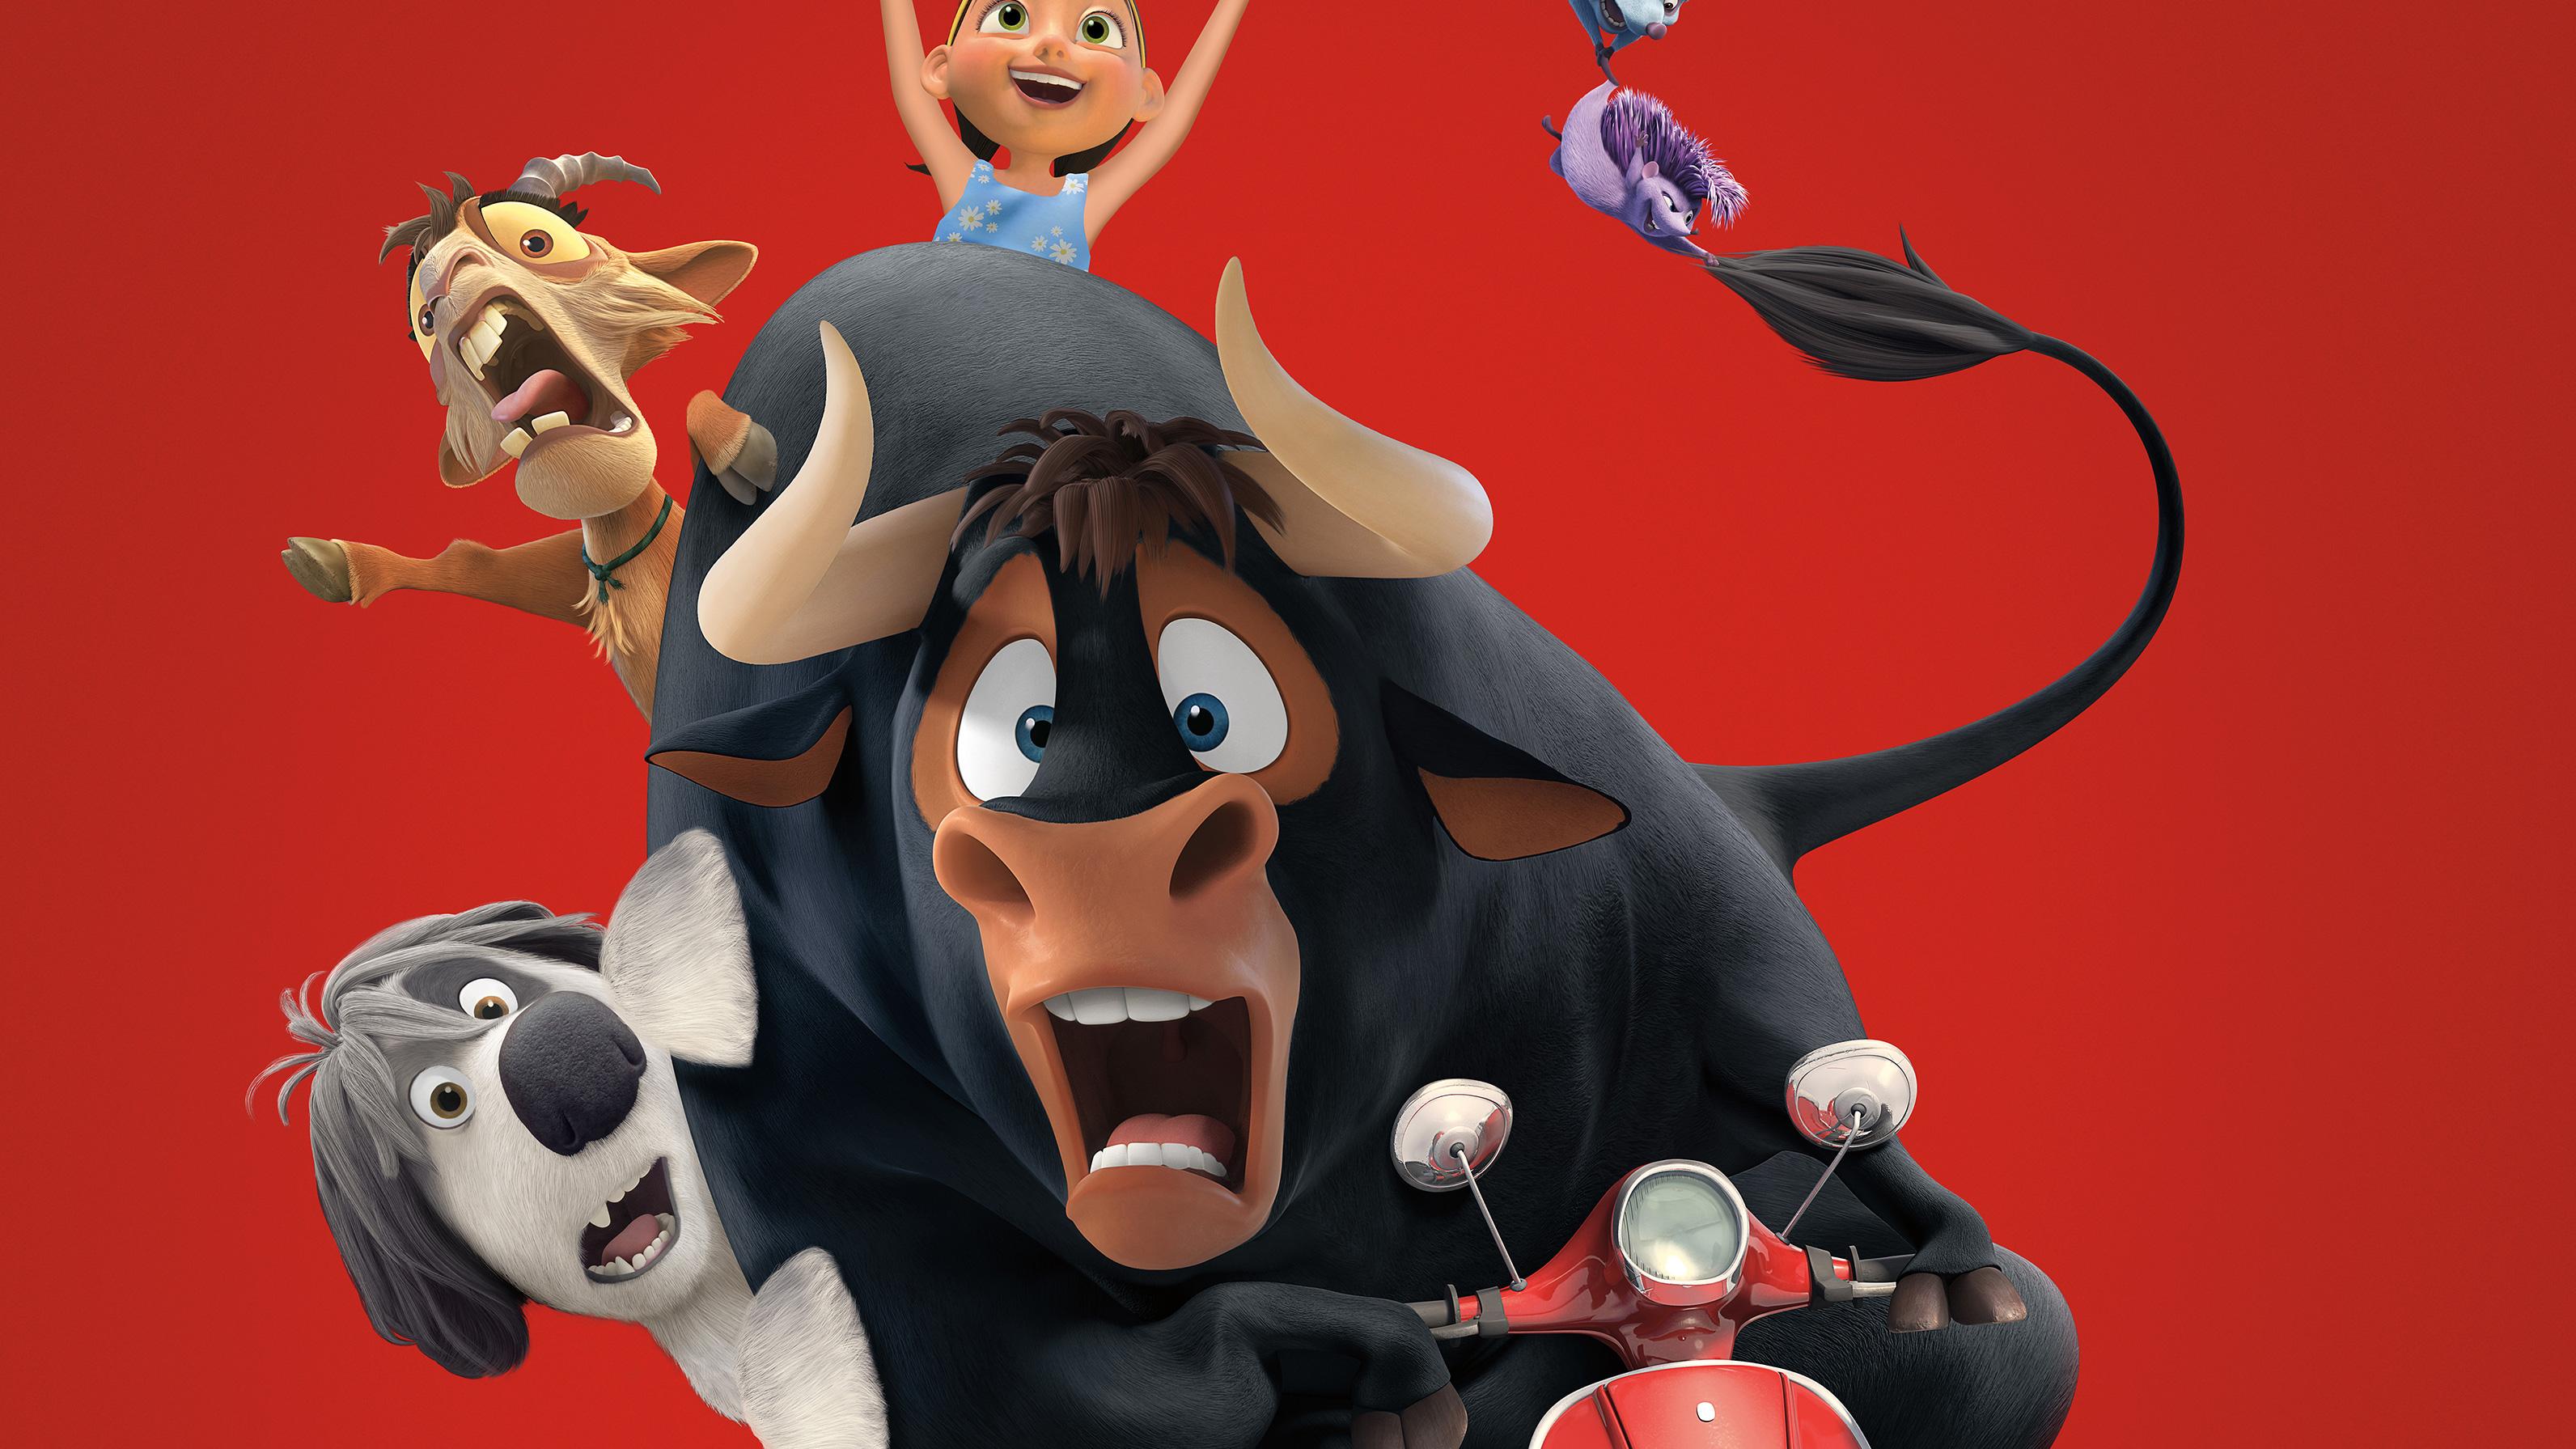 Ferdinand best animated movie of 2017 4k